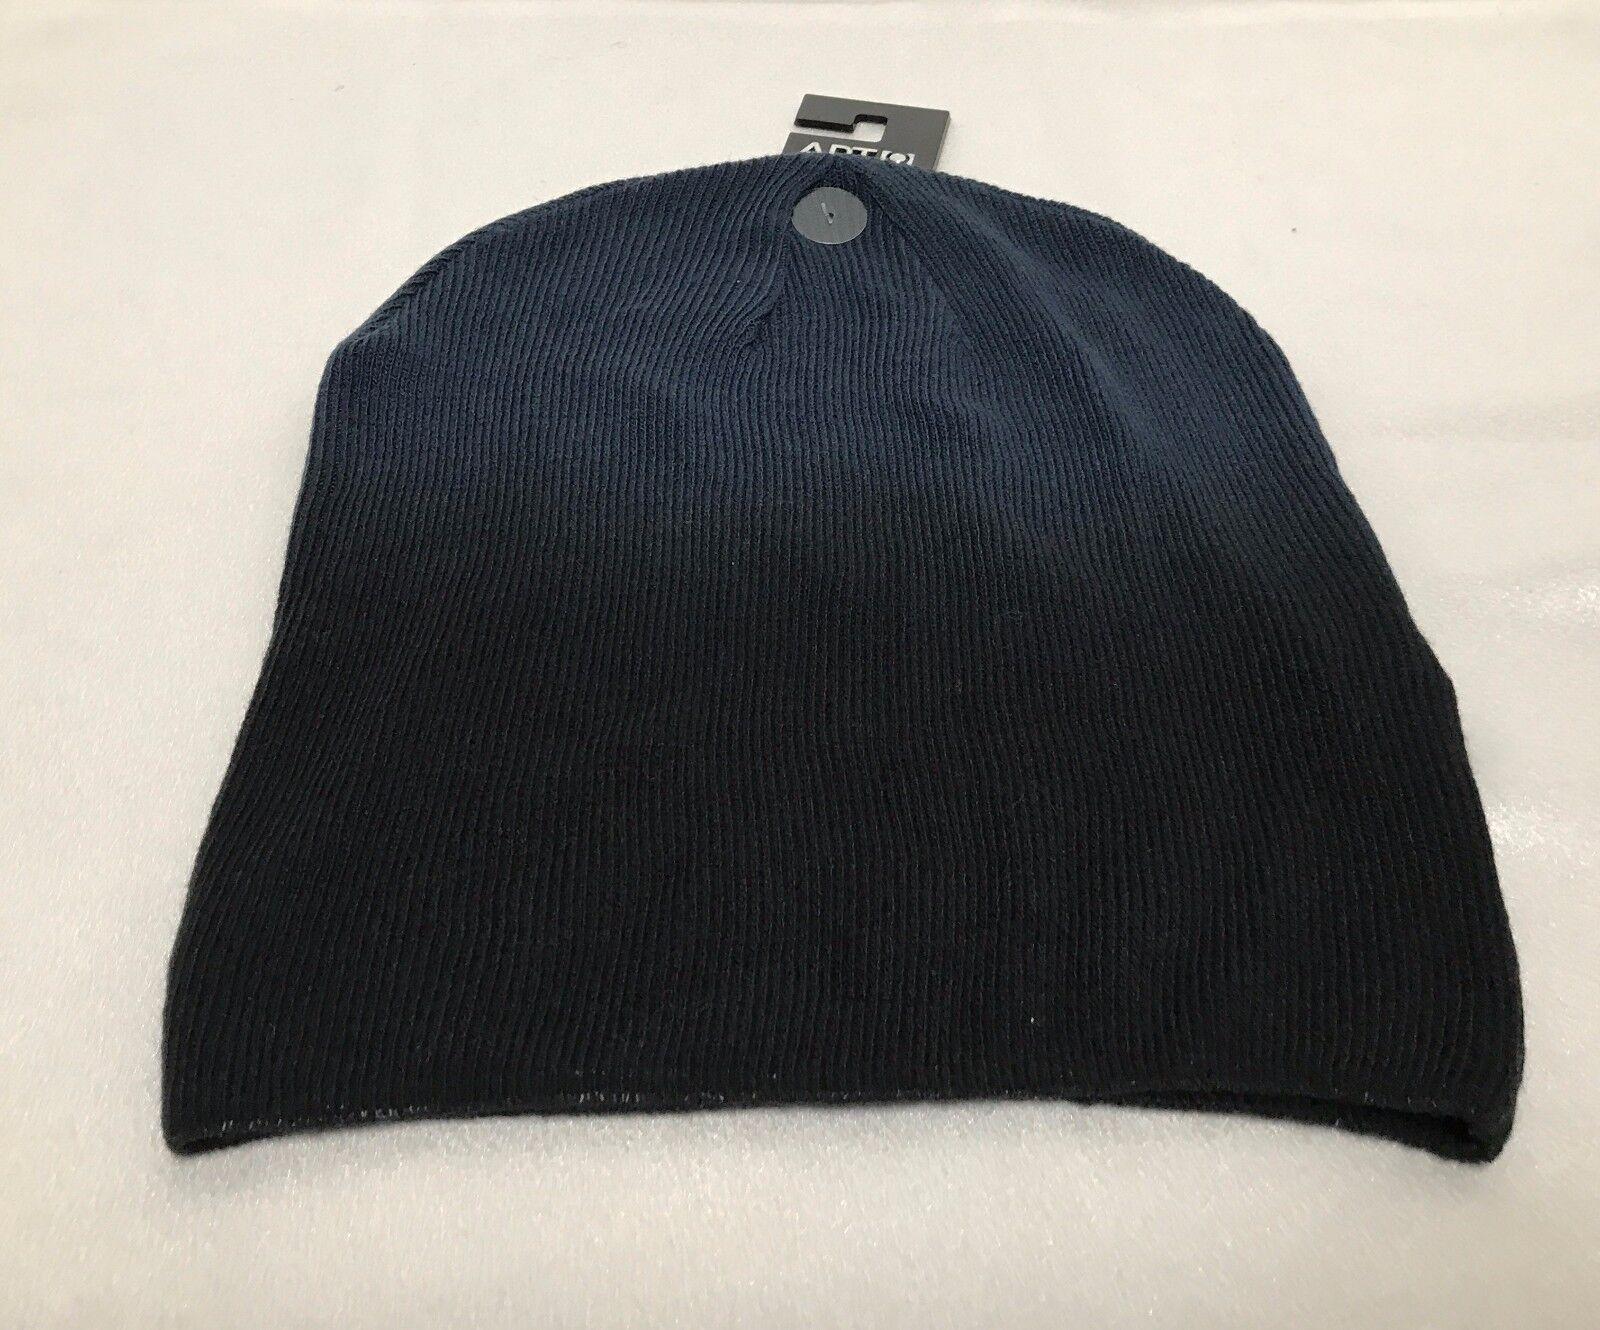 b6e4948336 APT 9 Womens Mens Knit Hat Beanie Navy Blue Graded Lightweight ...